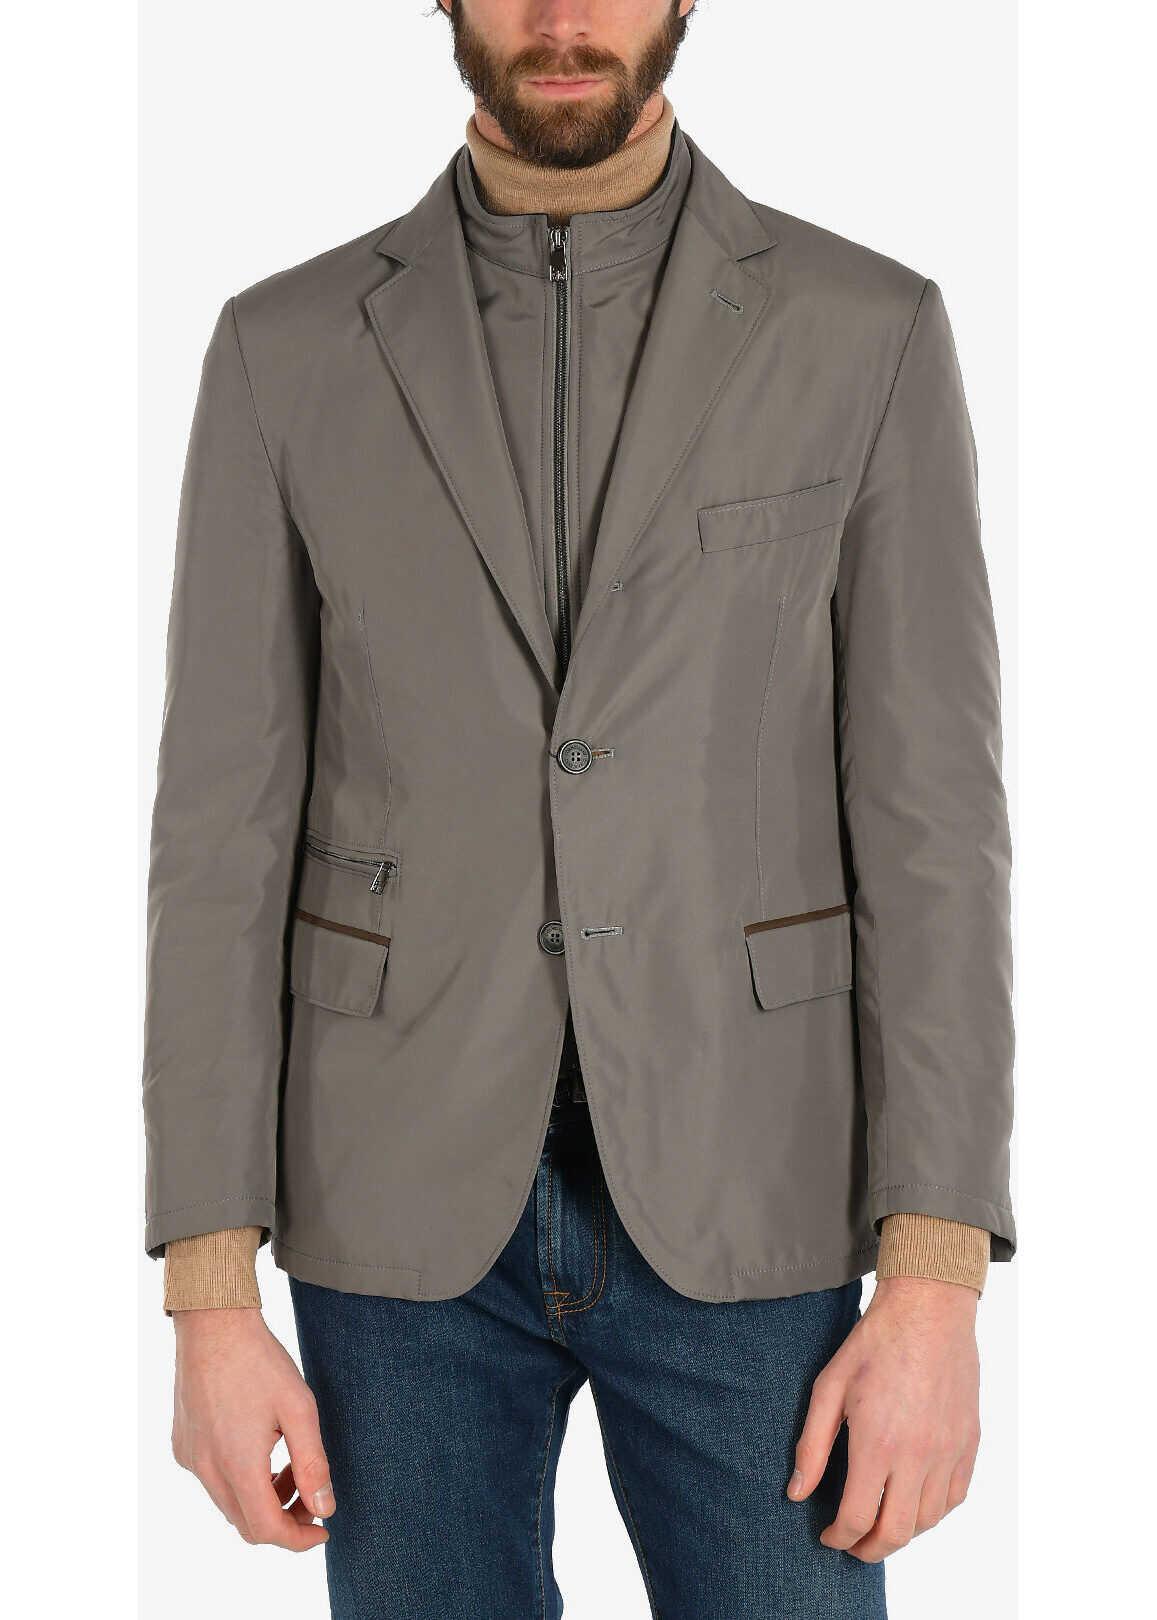 CORNELIANI ID OUTDOOR JKT 3-button blazer GRAY imagine